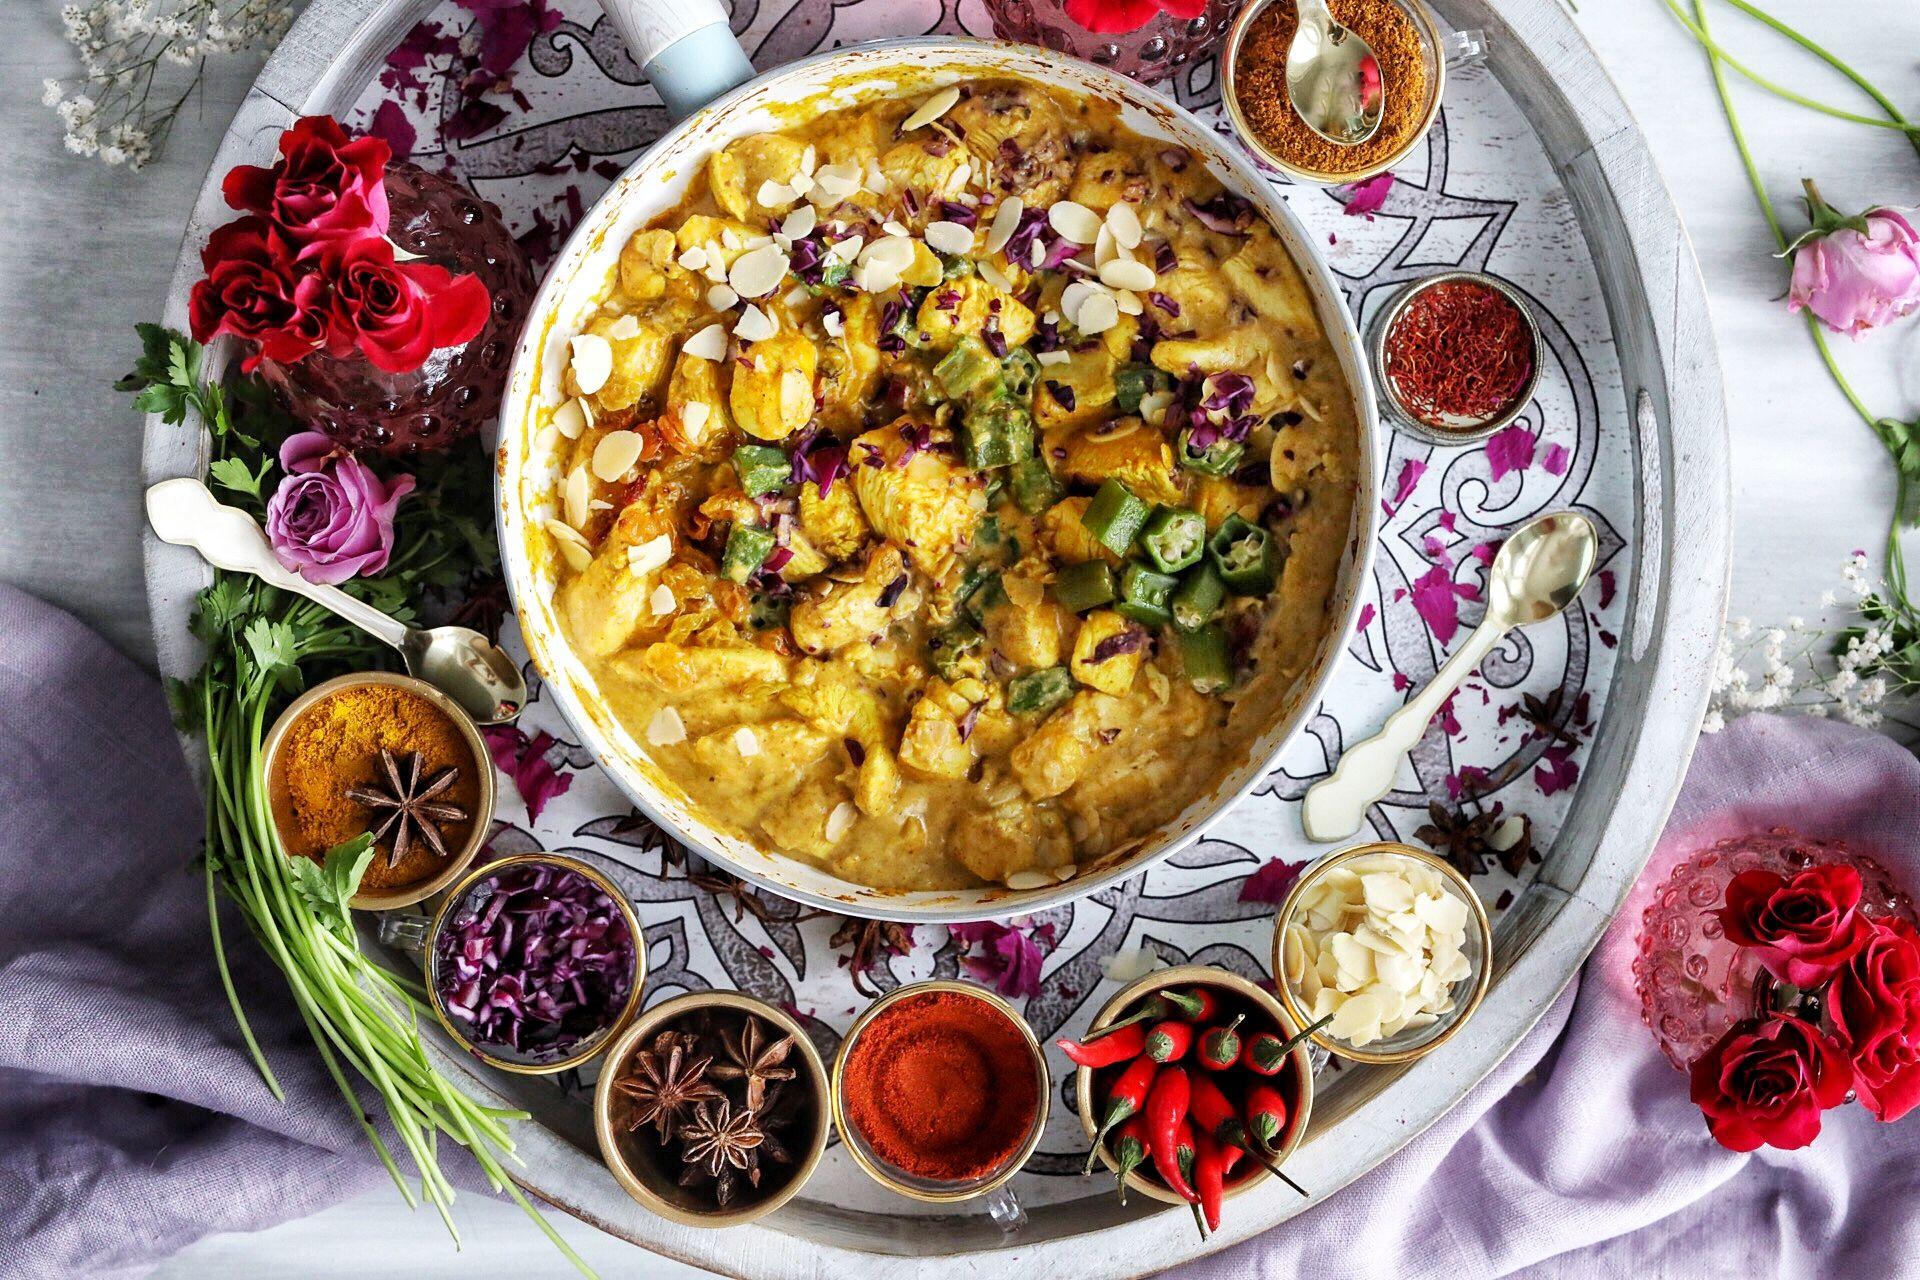 Patak S 3 Step Chicken Korma Medley With Almonds Golden Raisins Recipe Chicken Korma Korma Indian Food Recipes